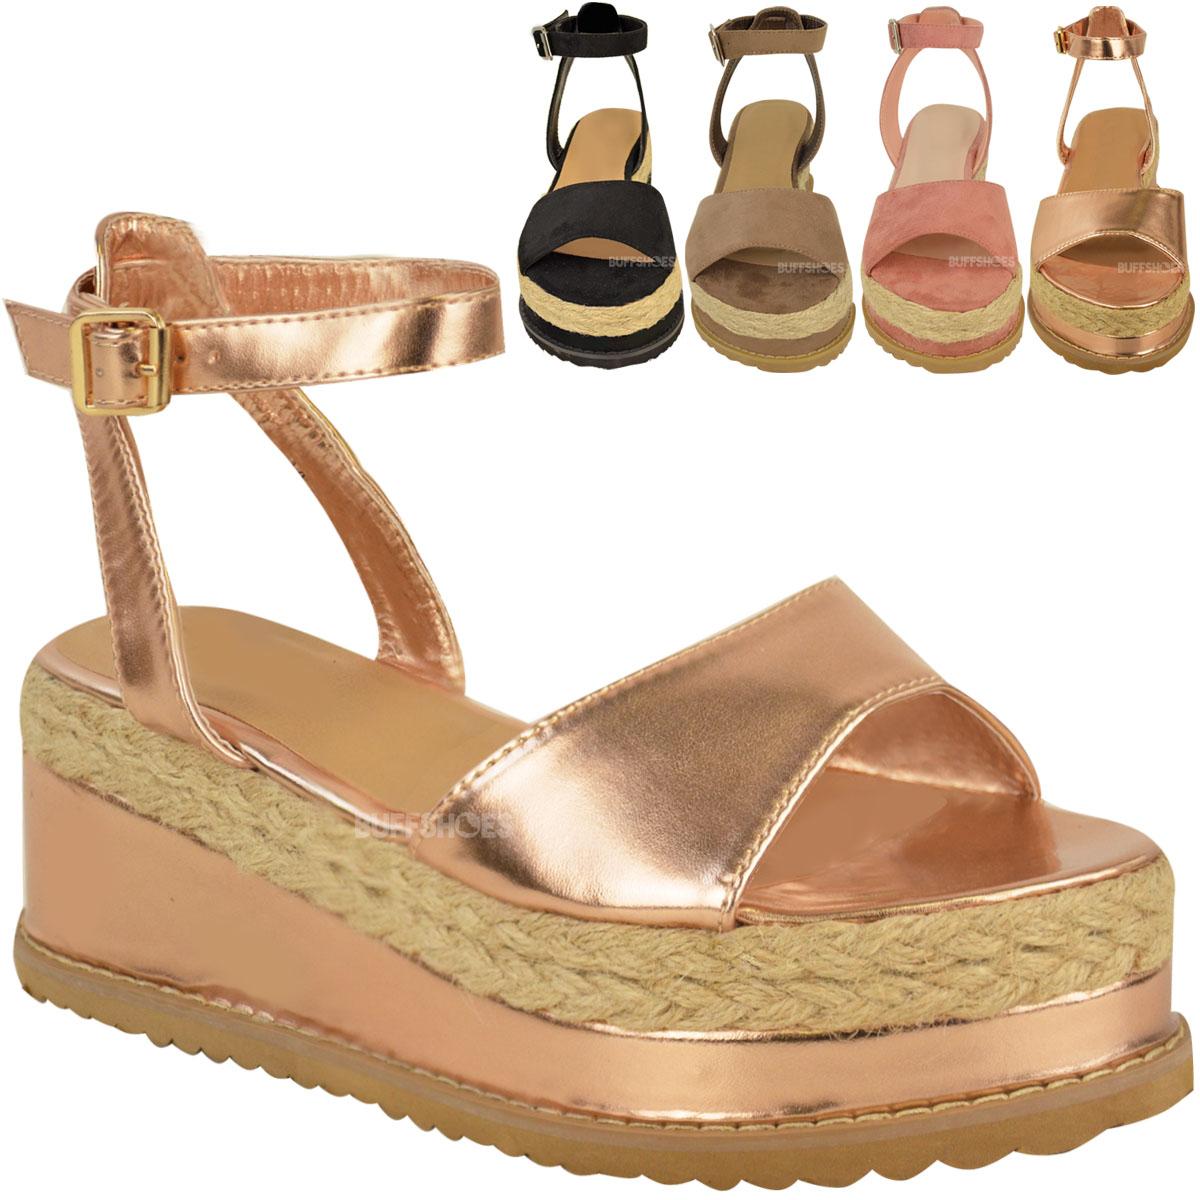 damen espadrille sandalen mit plateusohle kn chelriemen. Black Bedroom Furniture Sets. Home Design Ideas